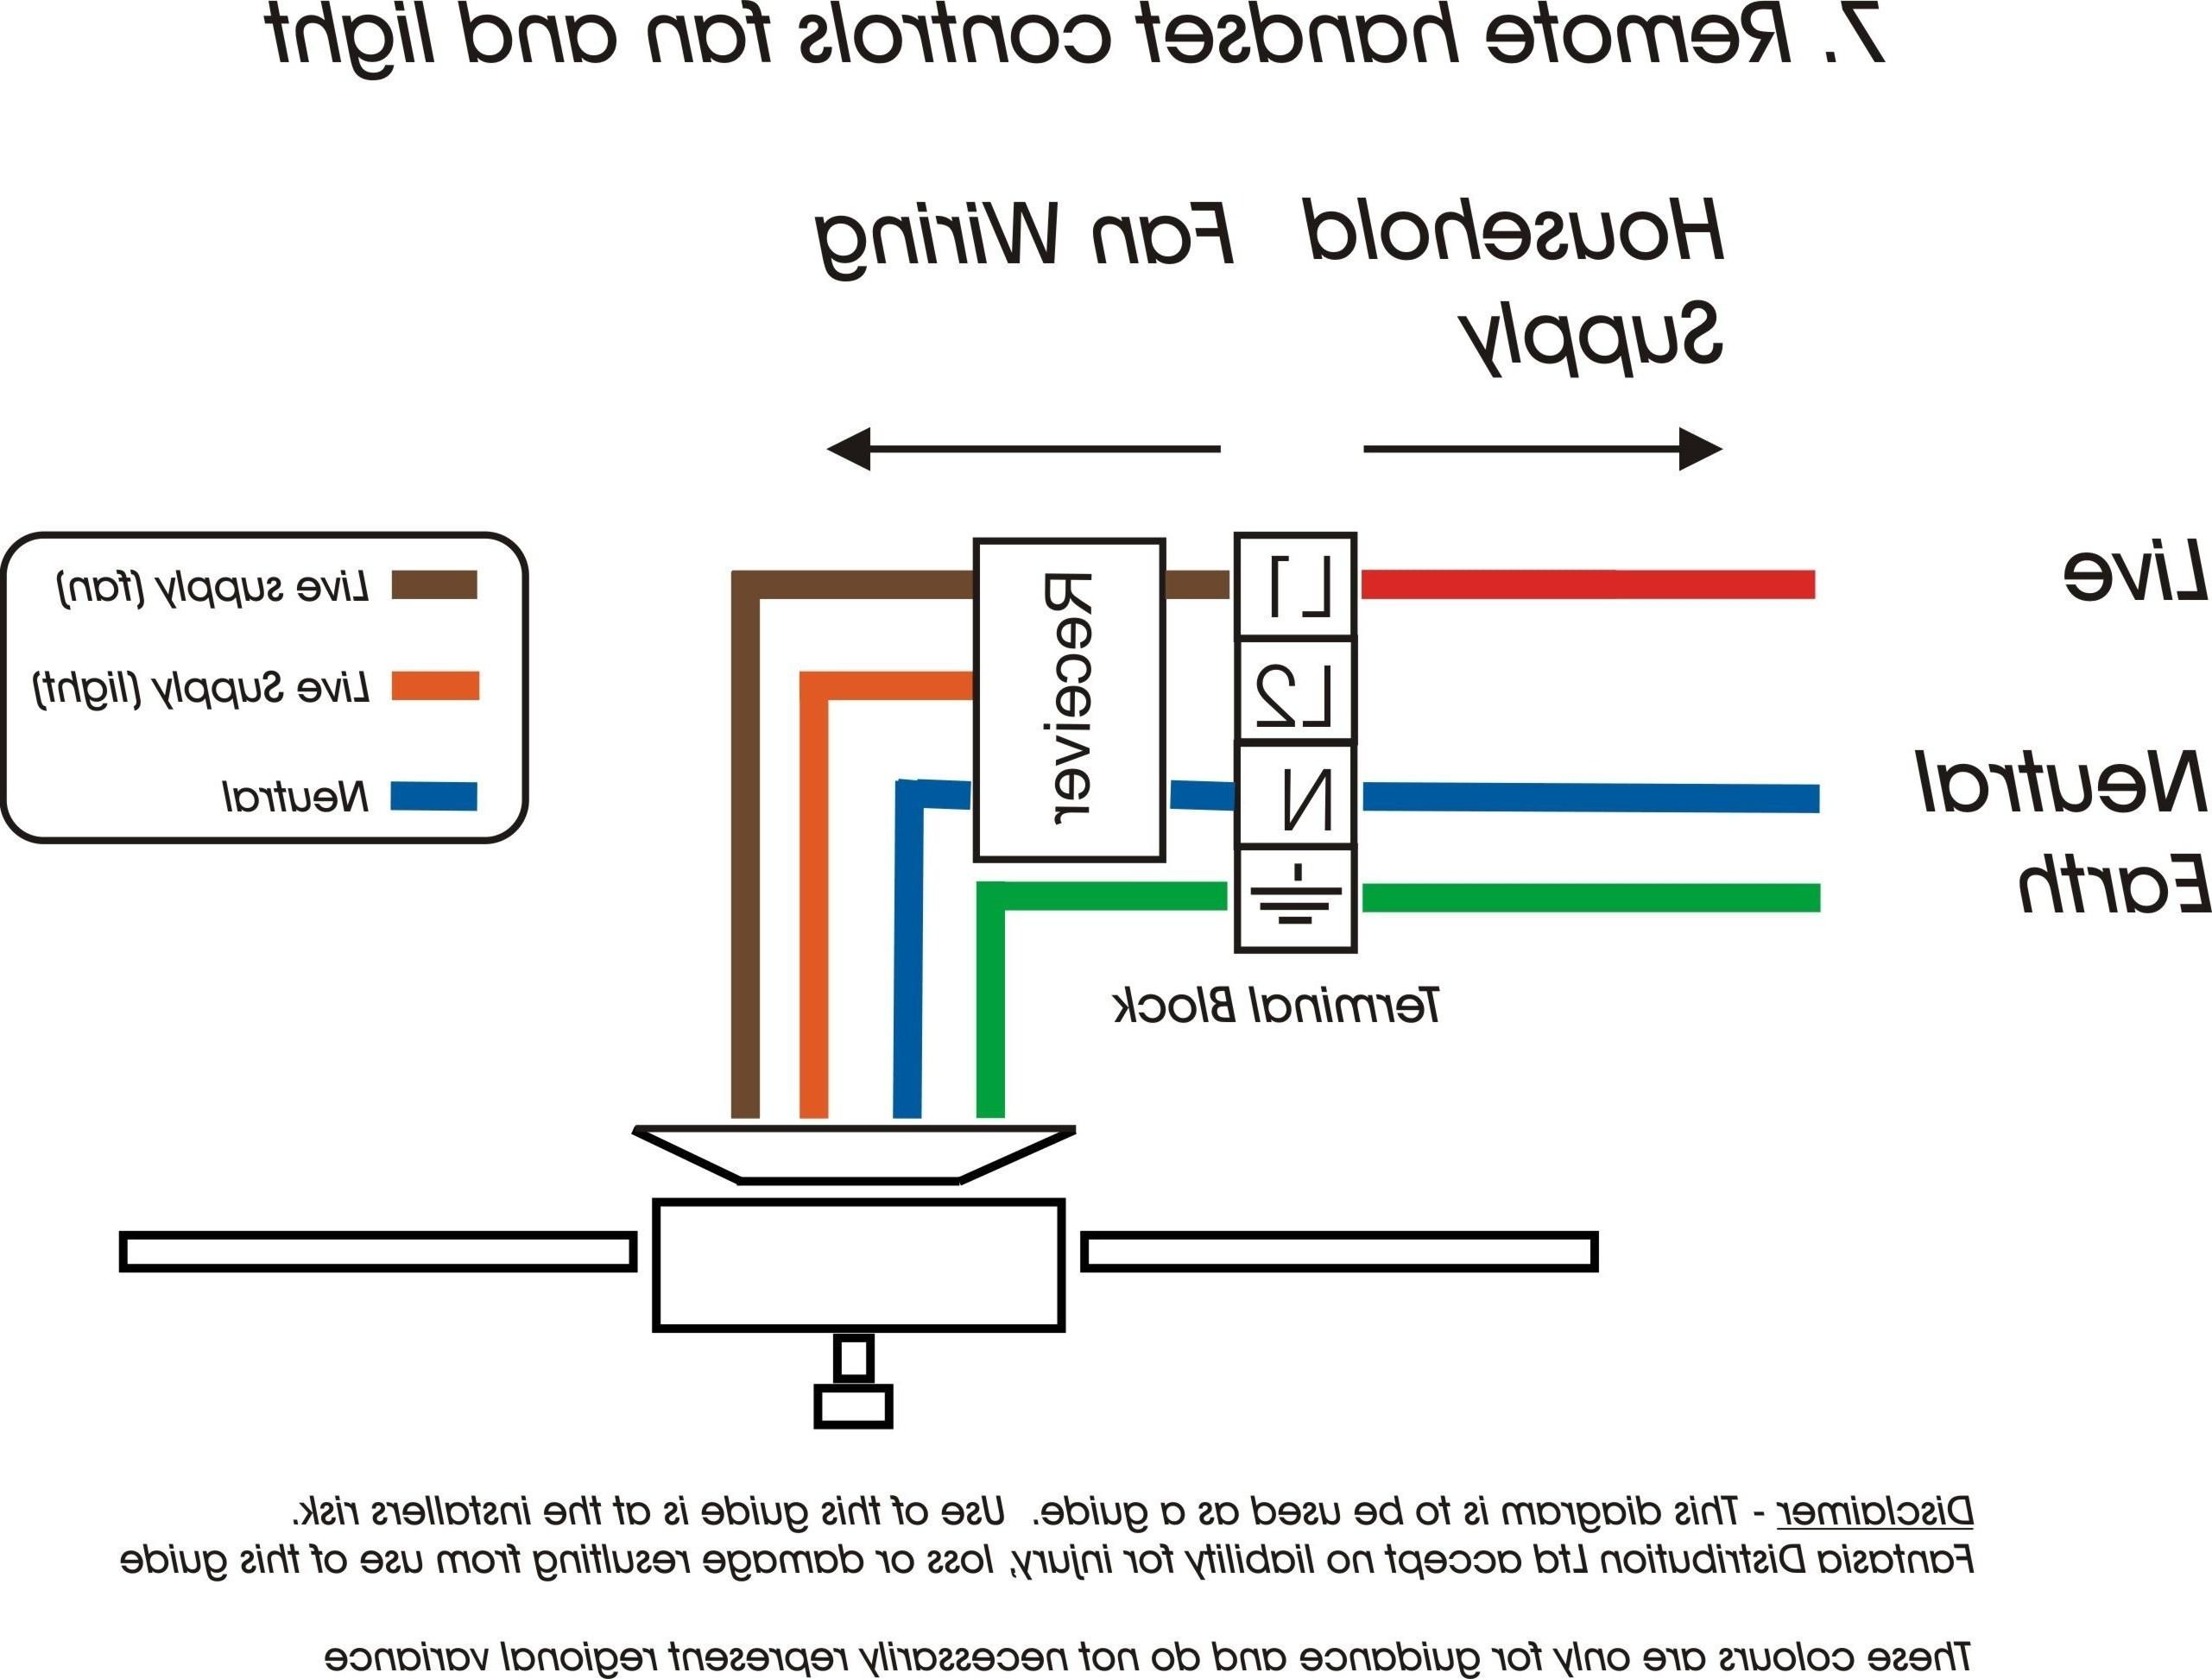 7 Way Trailer Plug Wiring Diagram 7 Way Plug Wiring Diagram Awesome 60 Lovely Wiring Diagram for Gmc Of 7 Way Trailer Plug Wiring Diagram